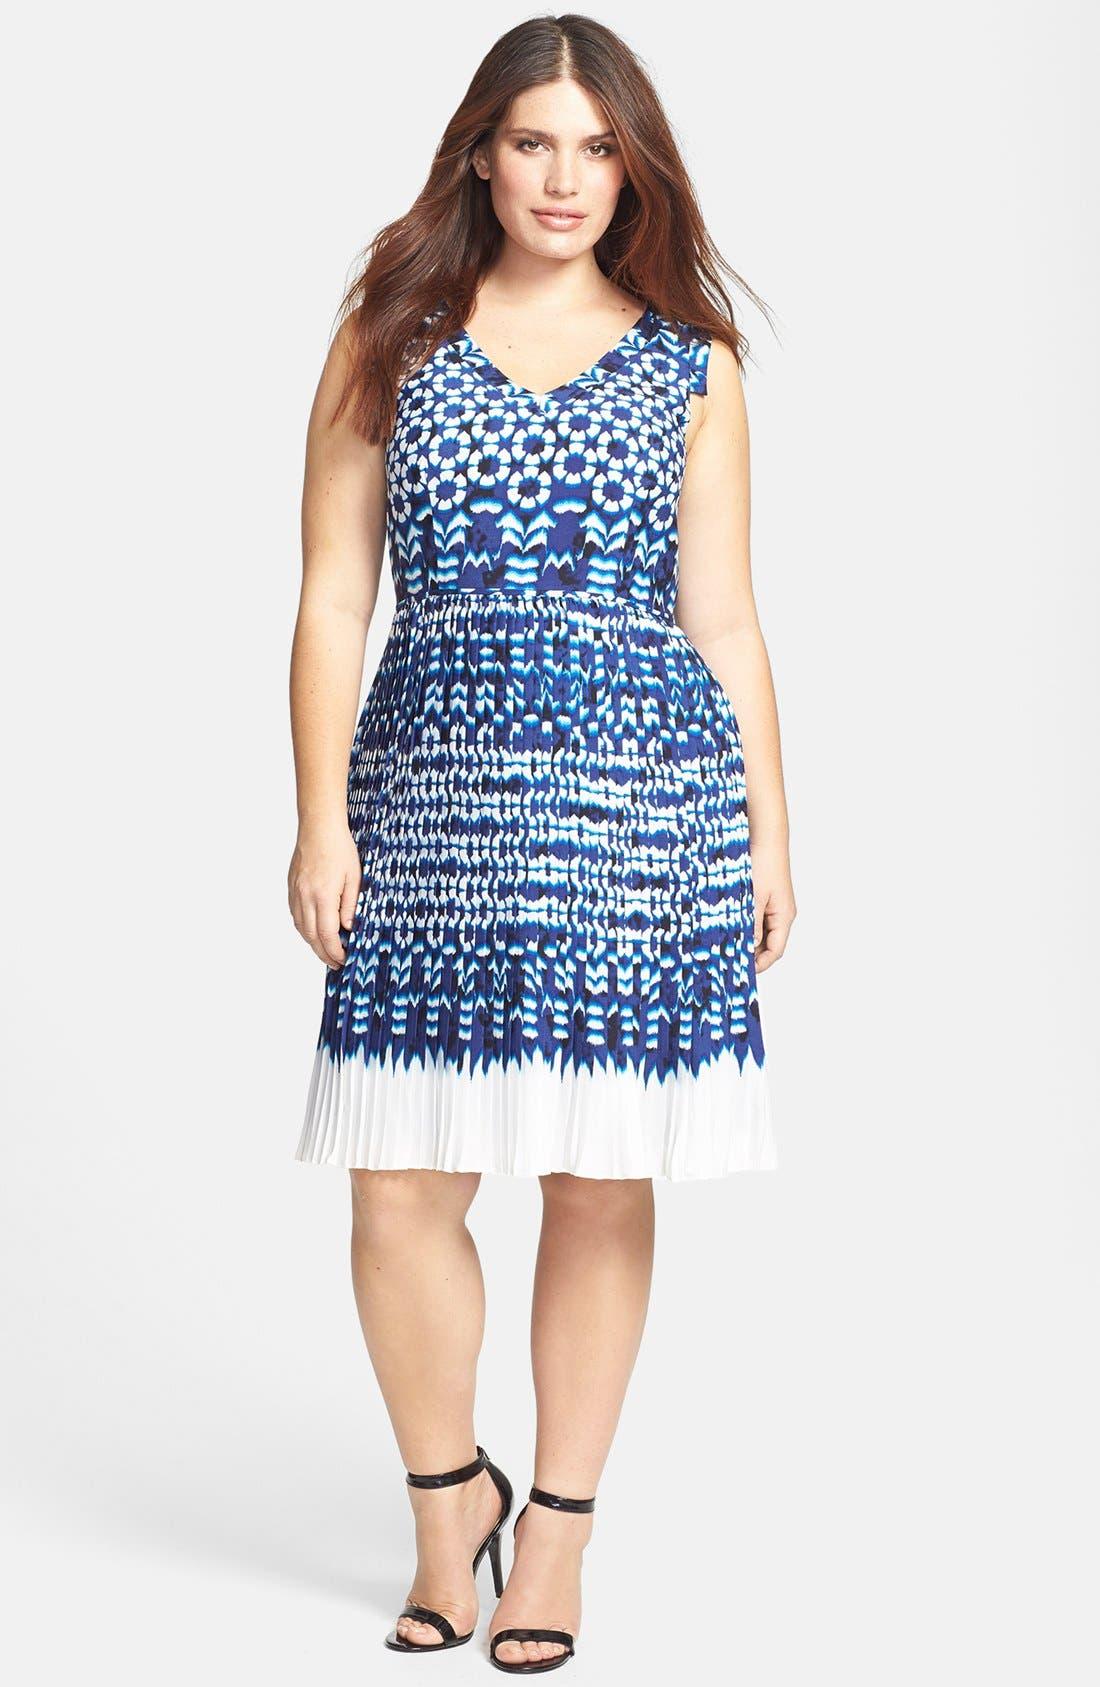 Main Image - Adrianna Papell Ikat Print Pleat Fit & Flare Dress (Plus Size)